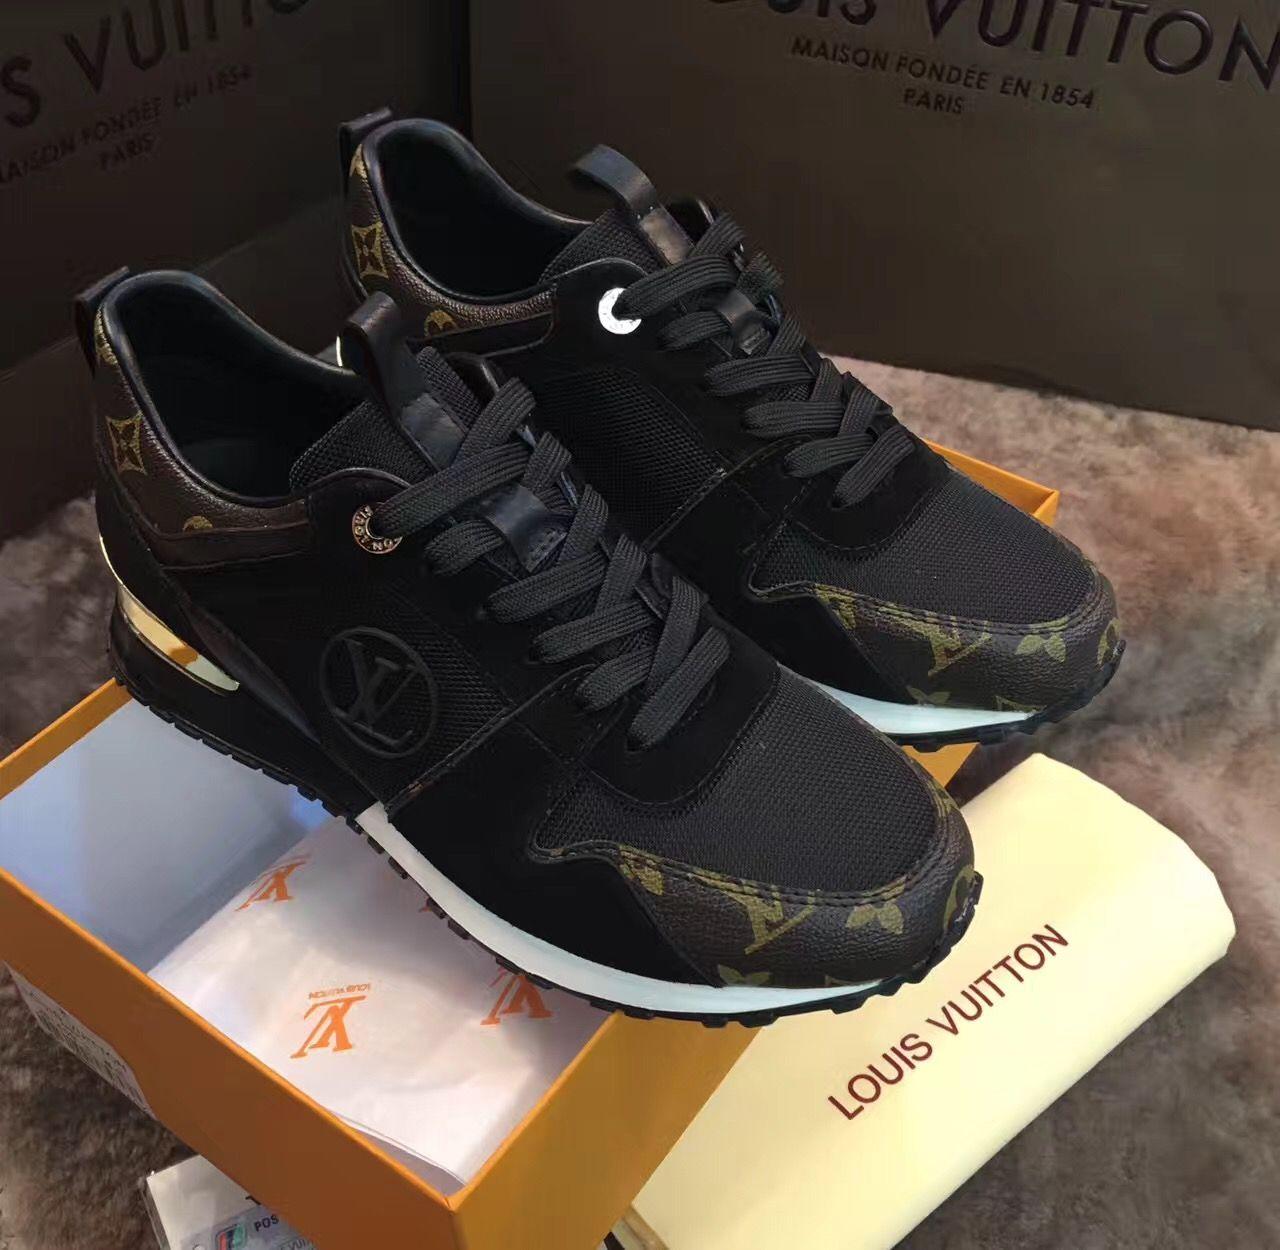 Lv Sneaker Men Shoes More Items Please Contact Wa Wechat